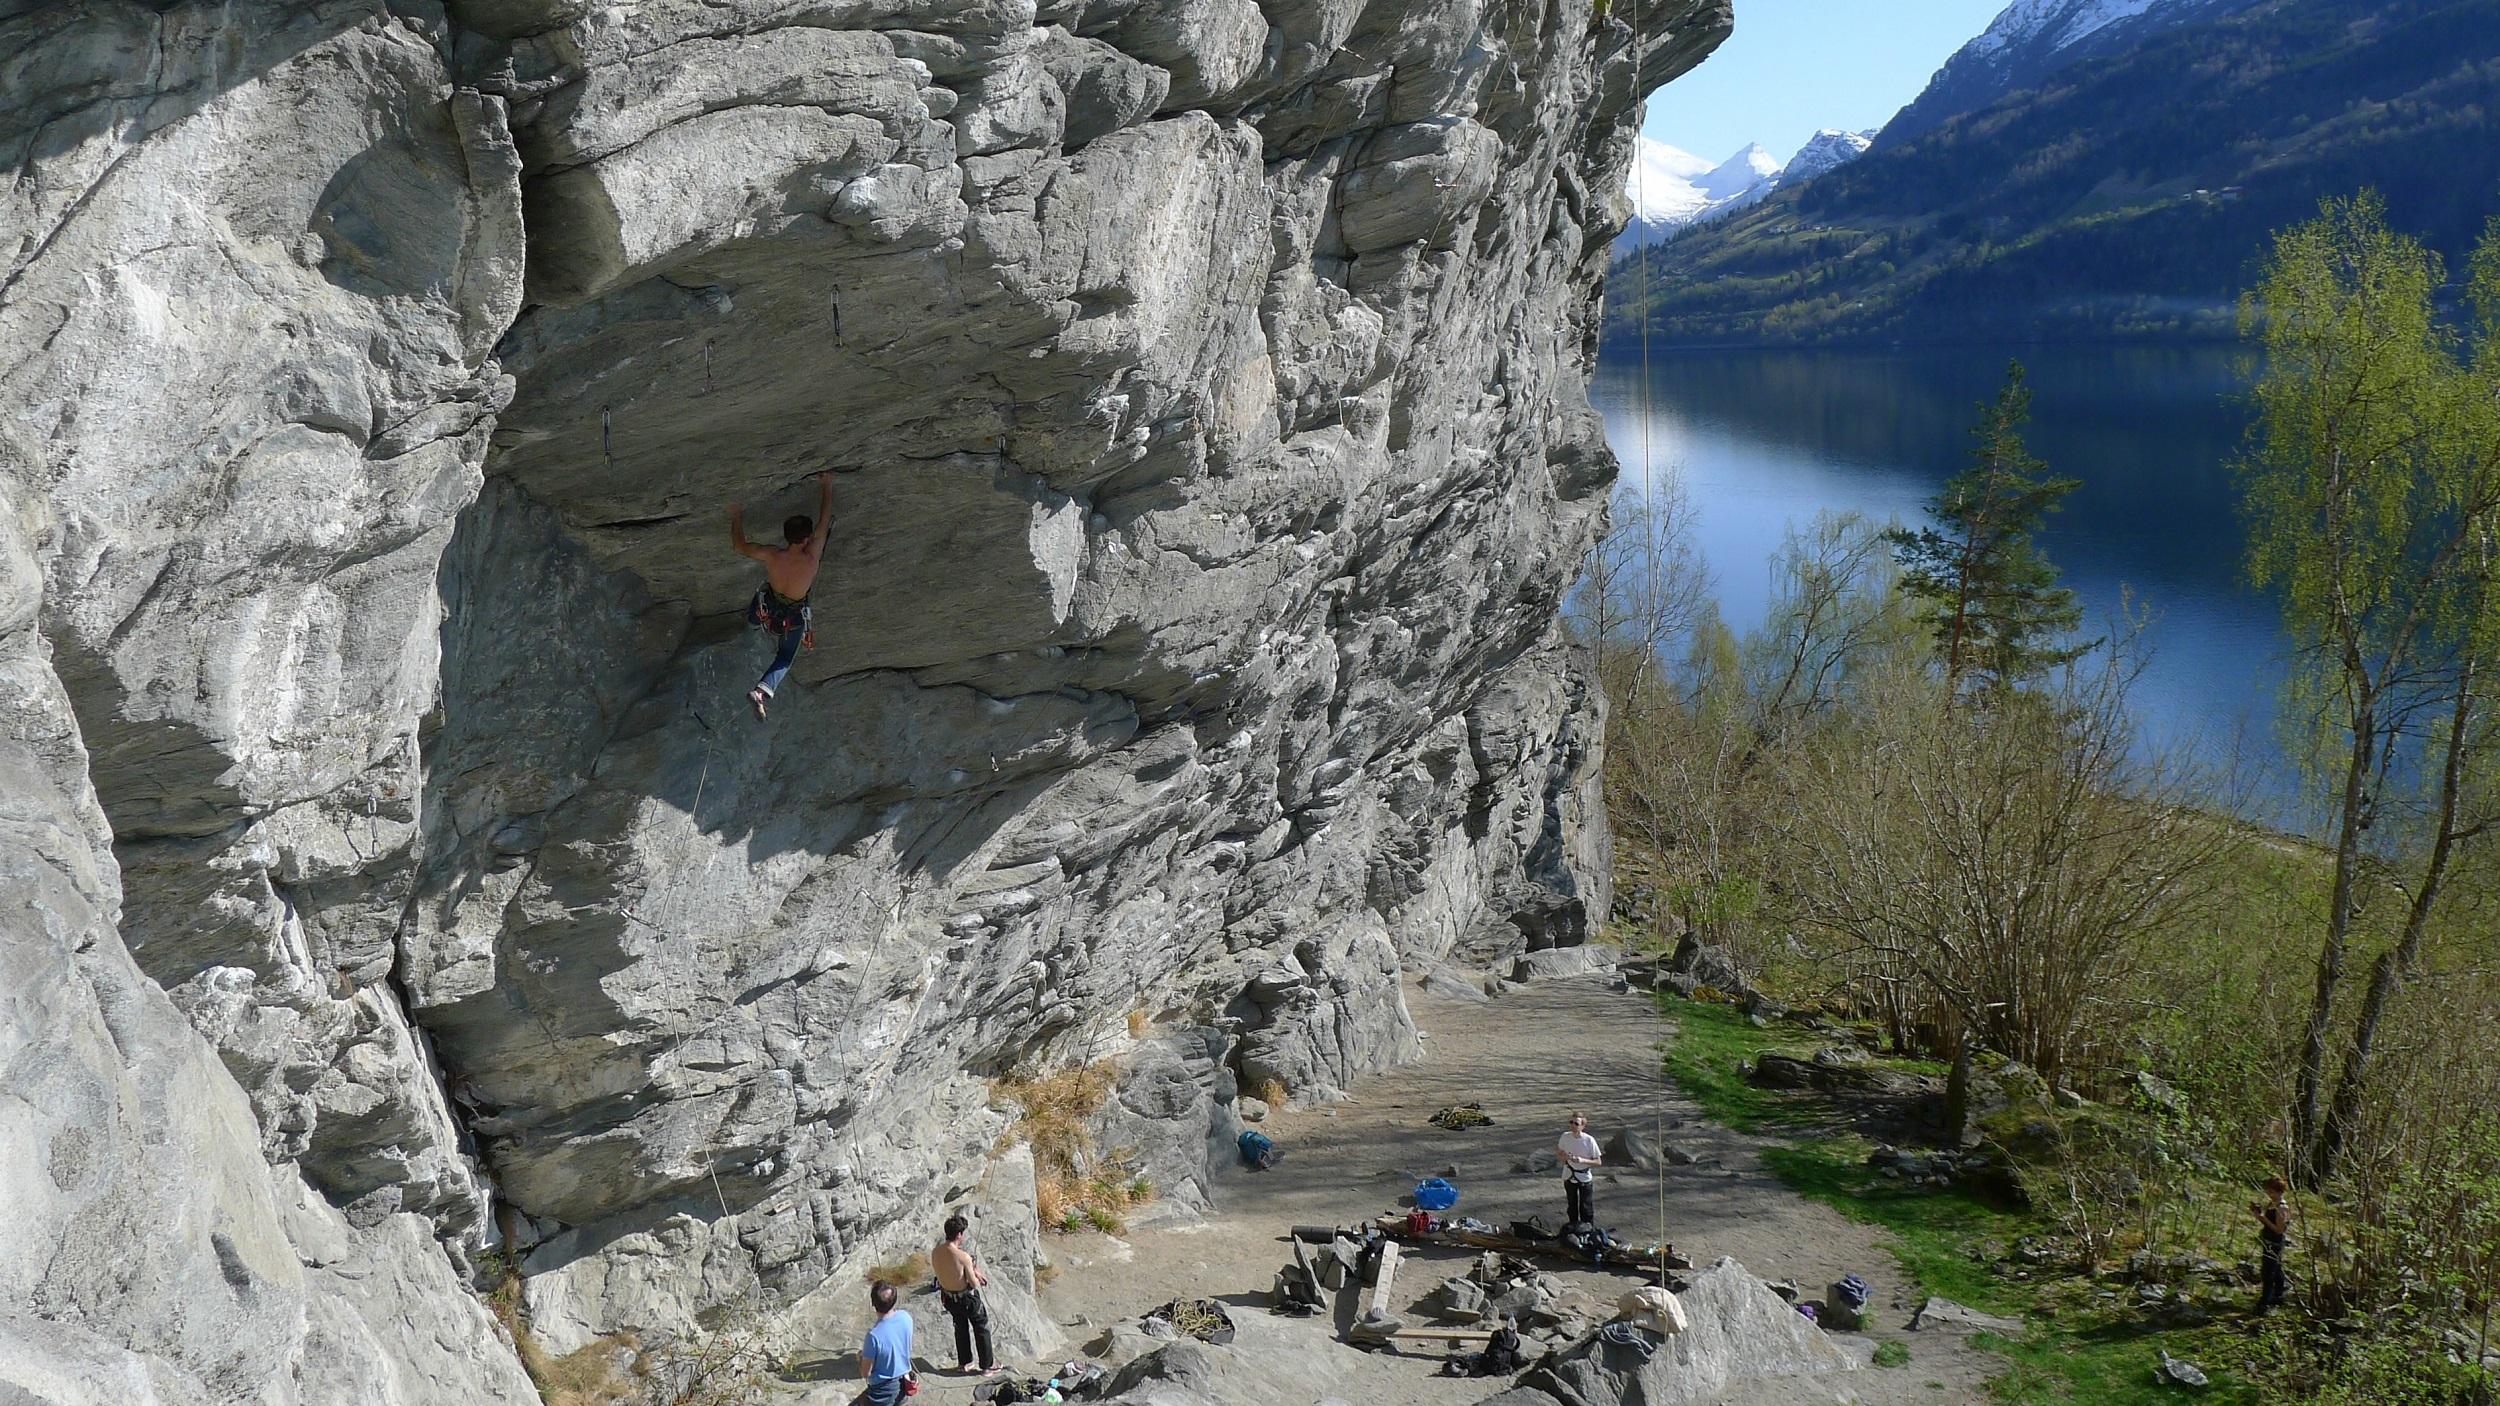 Beachen klatrefelt. Foto: Einar Løken/Breogfjell